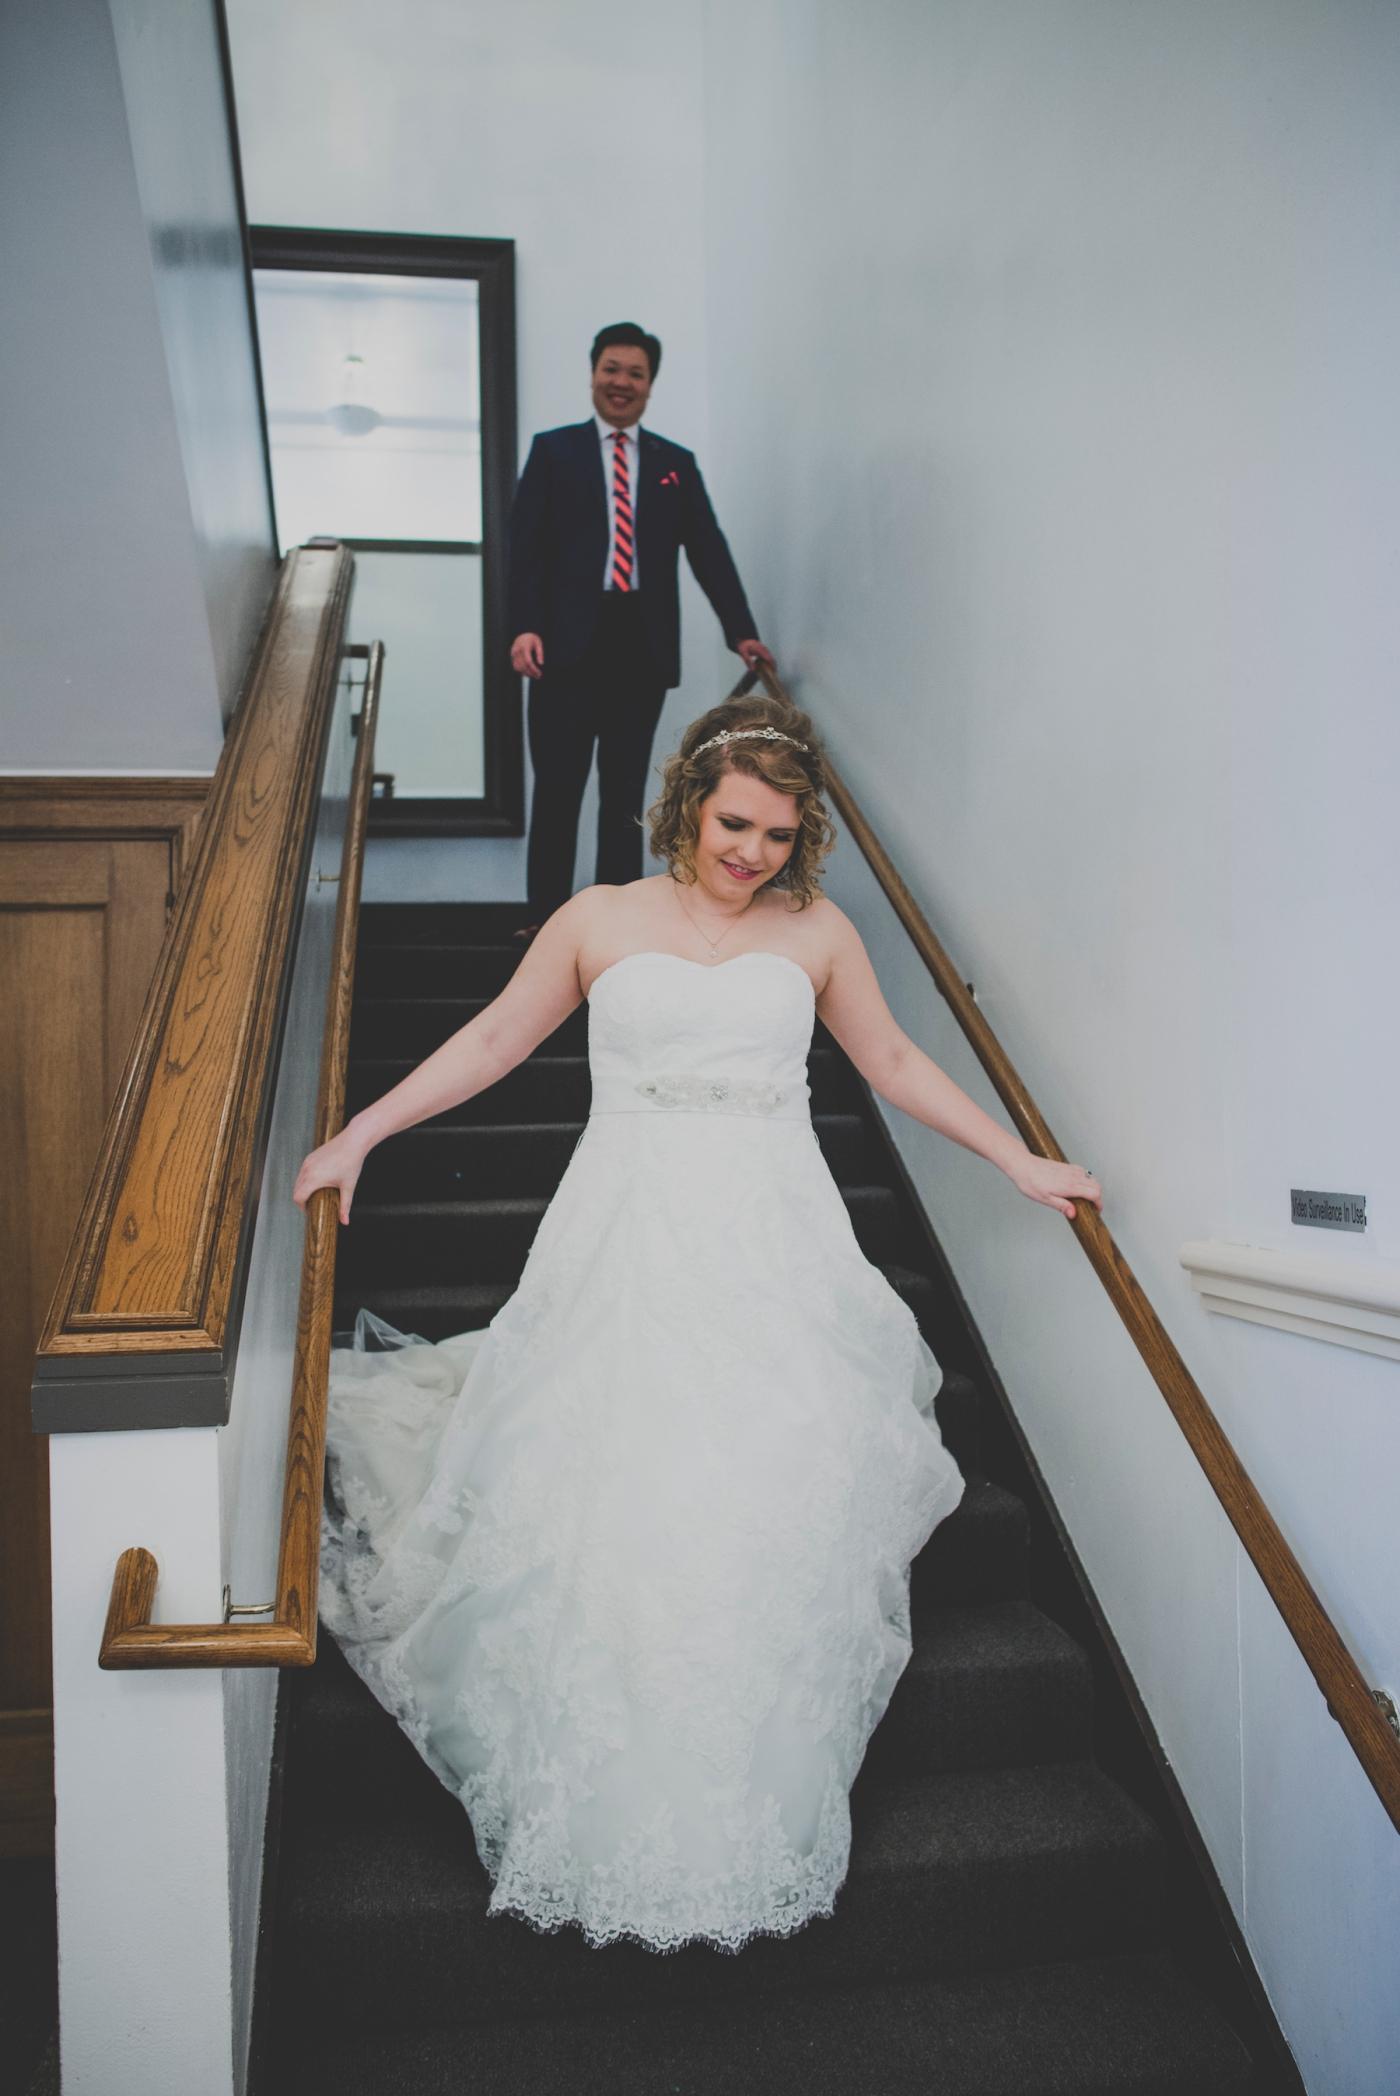 DSC_2089Everett_Wedding_Ballroom_Jane_Speleers_photography_Rachel_and_Edmund_First_look_2017